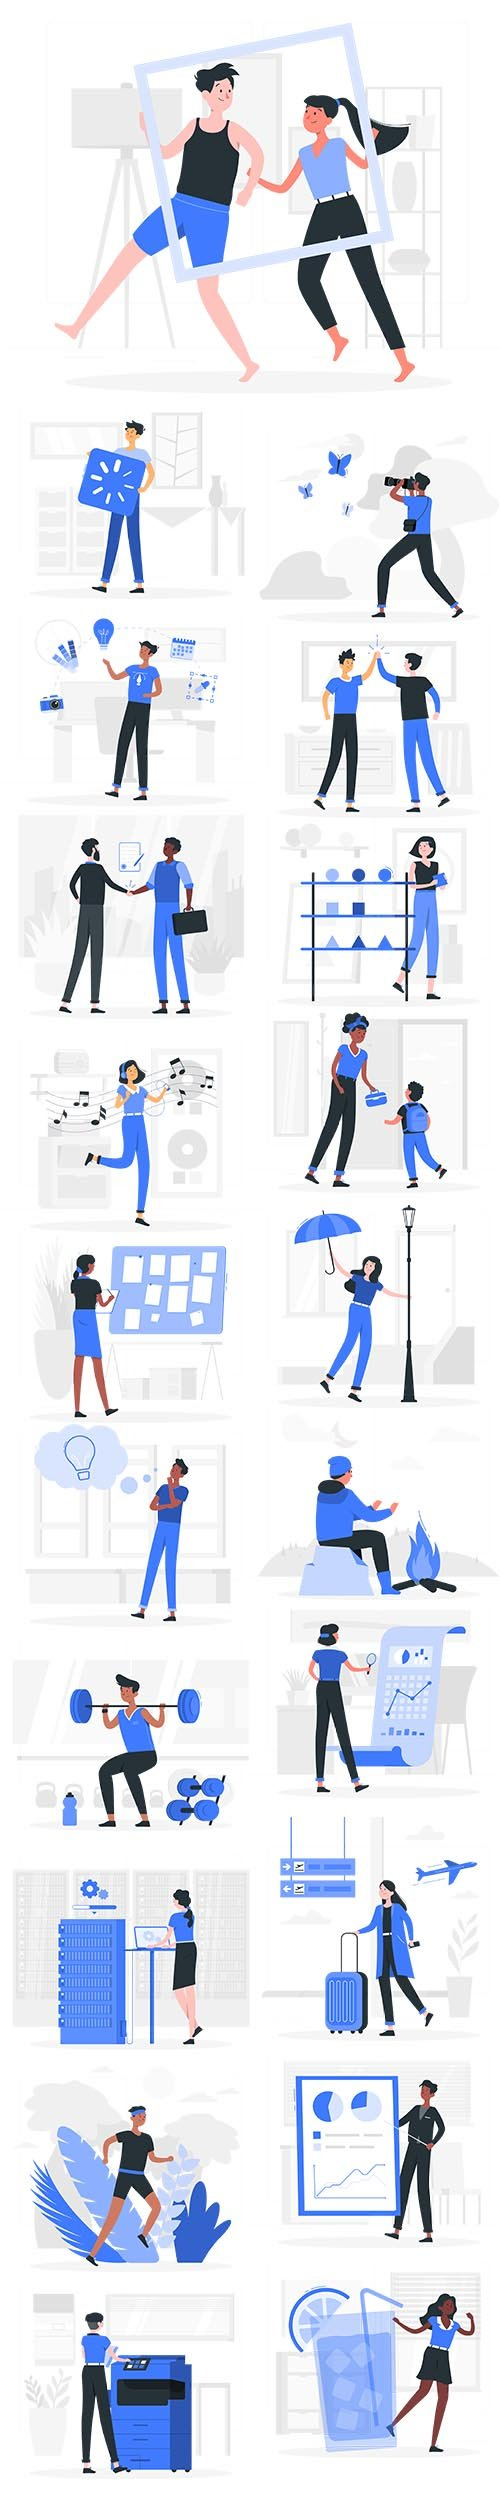 Vector Blu Illustrations People Concept Vol 3